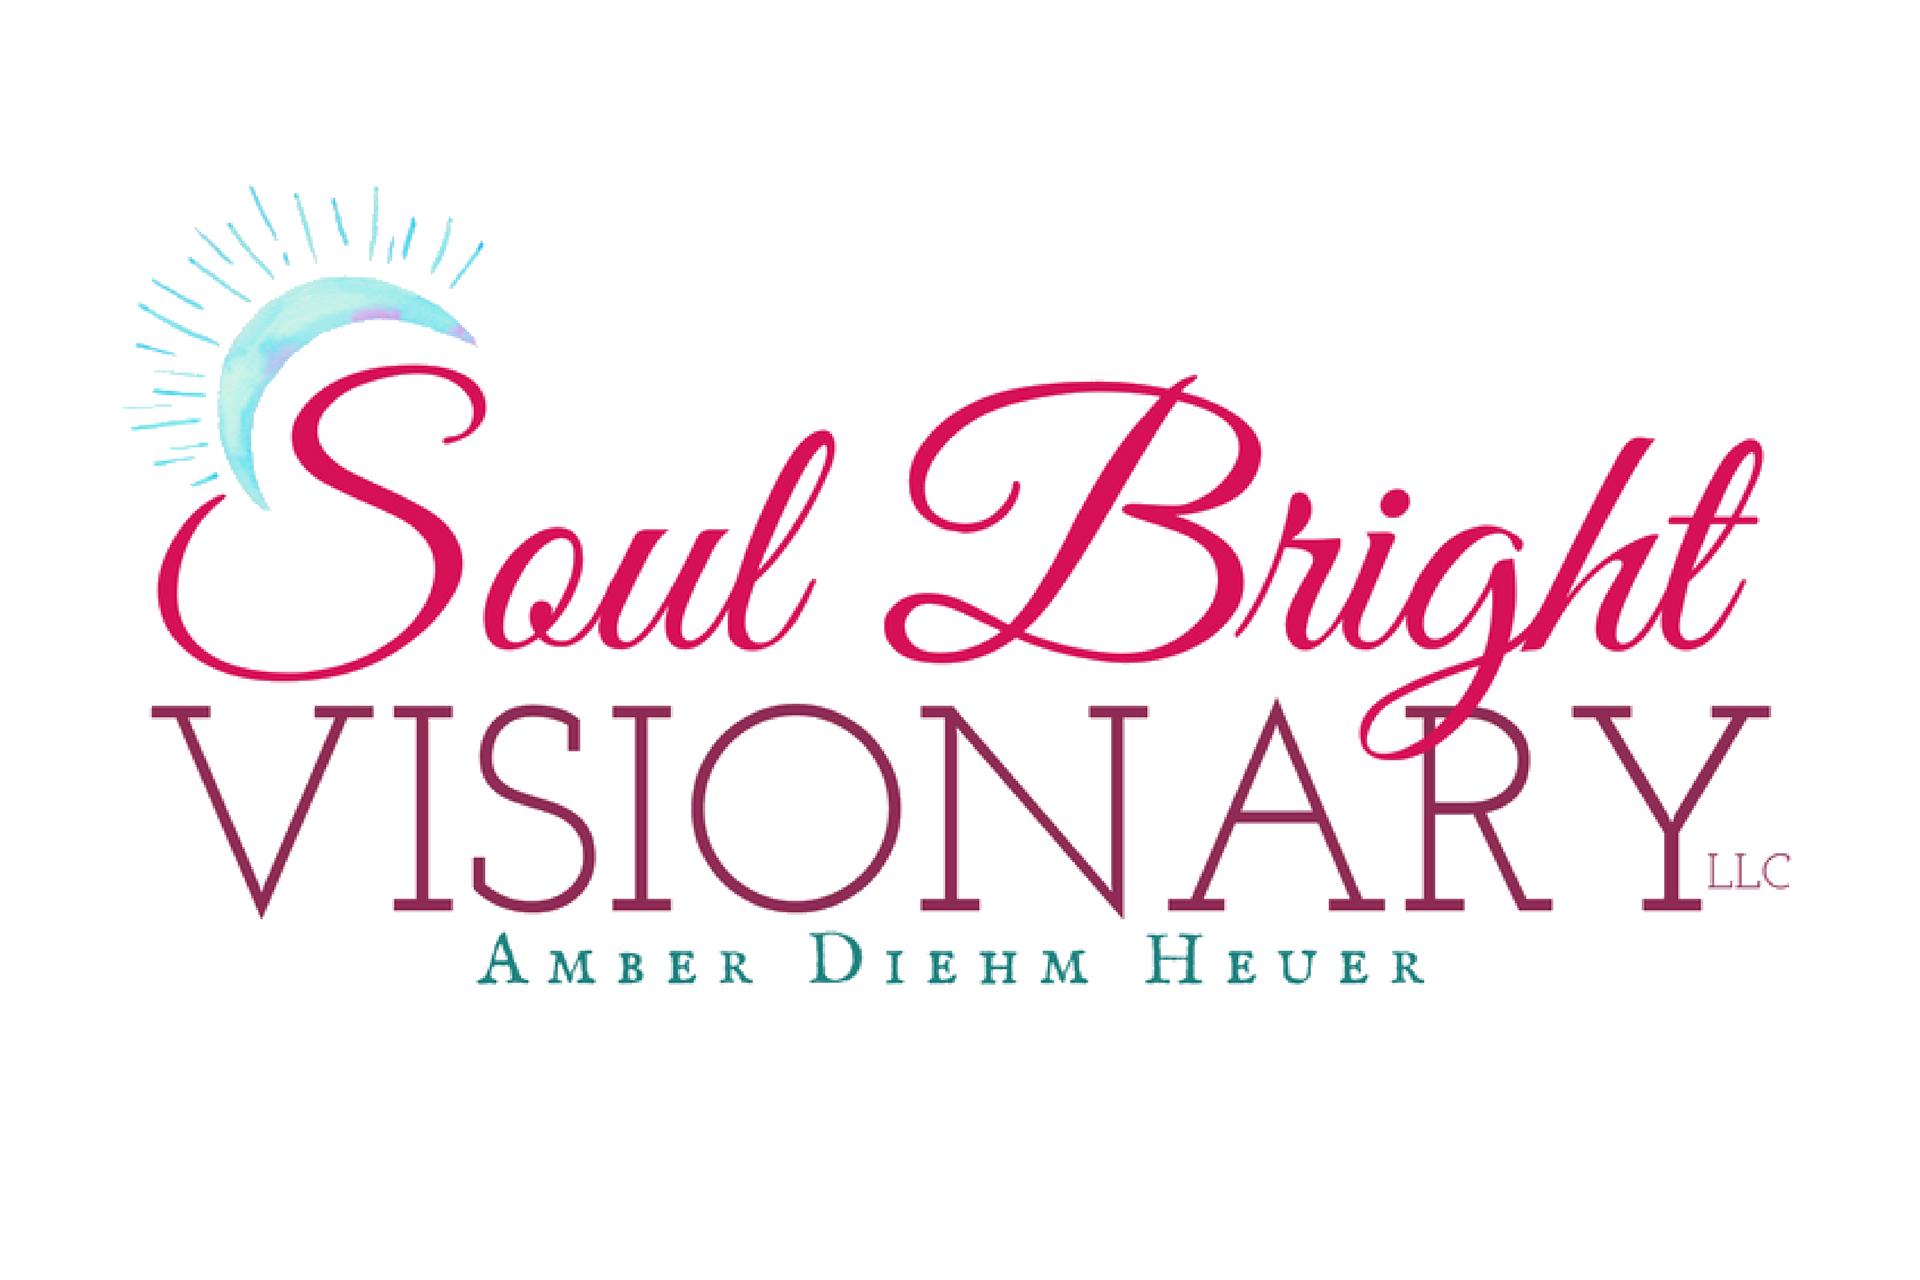 Soul Bright Visionary LLC | Amber Diehm Heuer